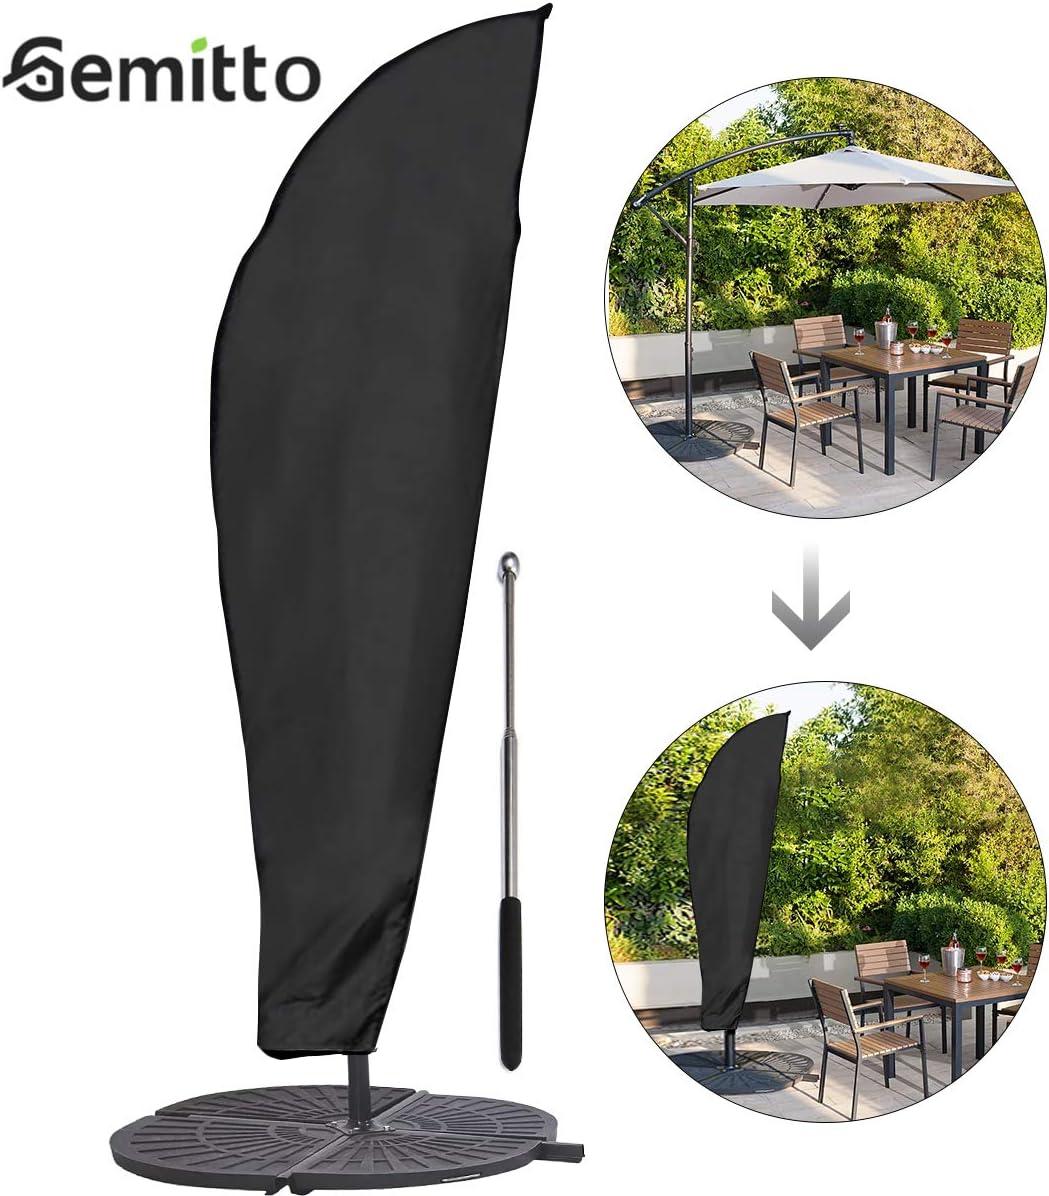 GEMITTO Funda Protectora de Sombrilla, Impermeable Funda para Parasol con Cremallera, Oxford 210D Protectora para Parasol de Jardín Patio Terraza Intemperie 9-11ft